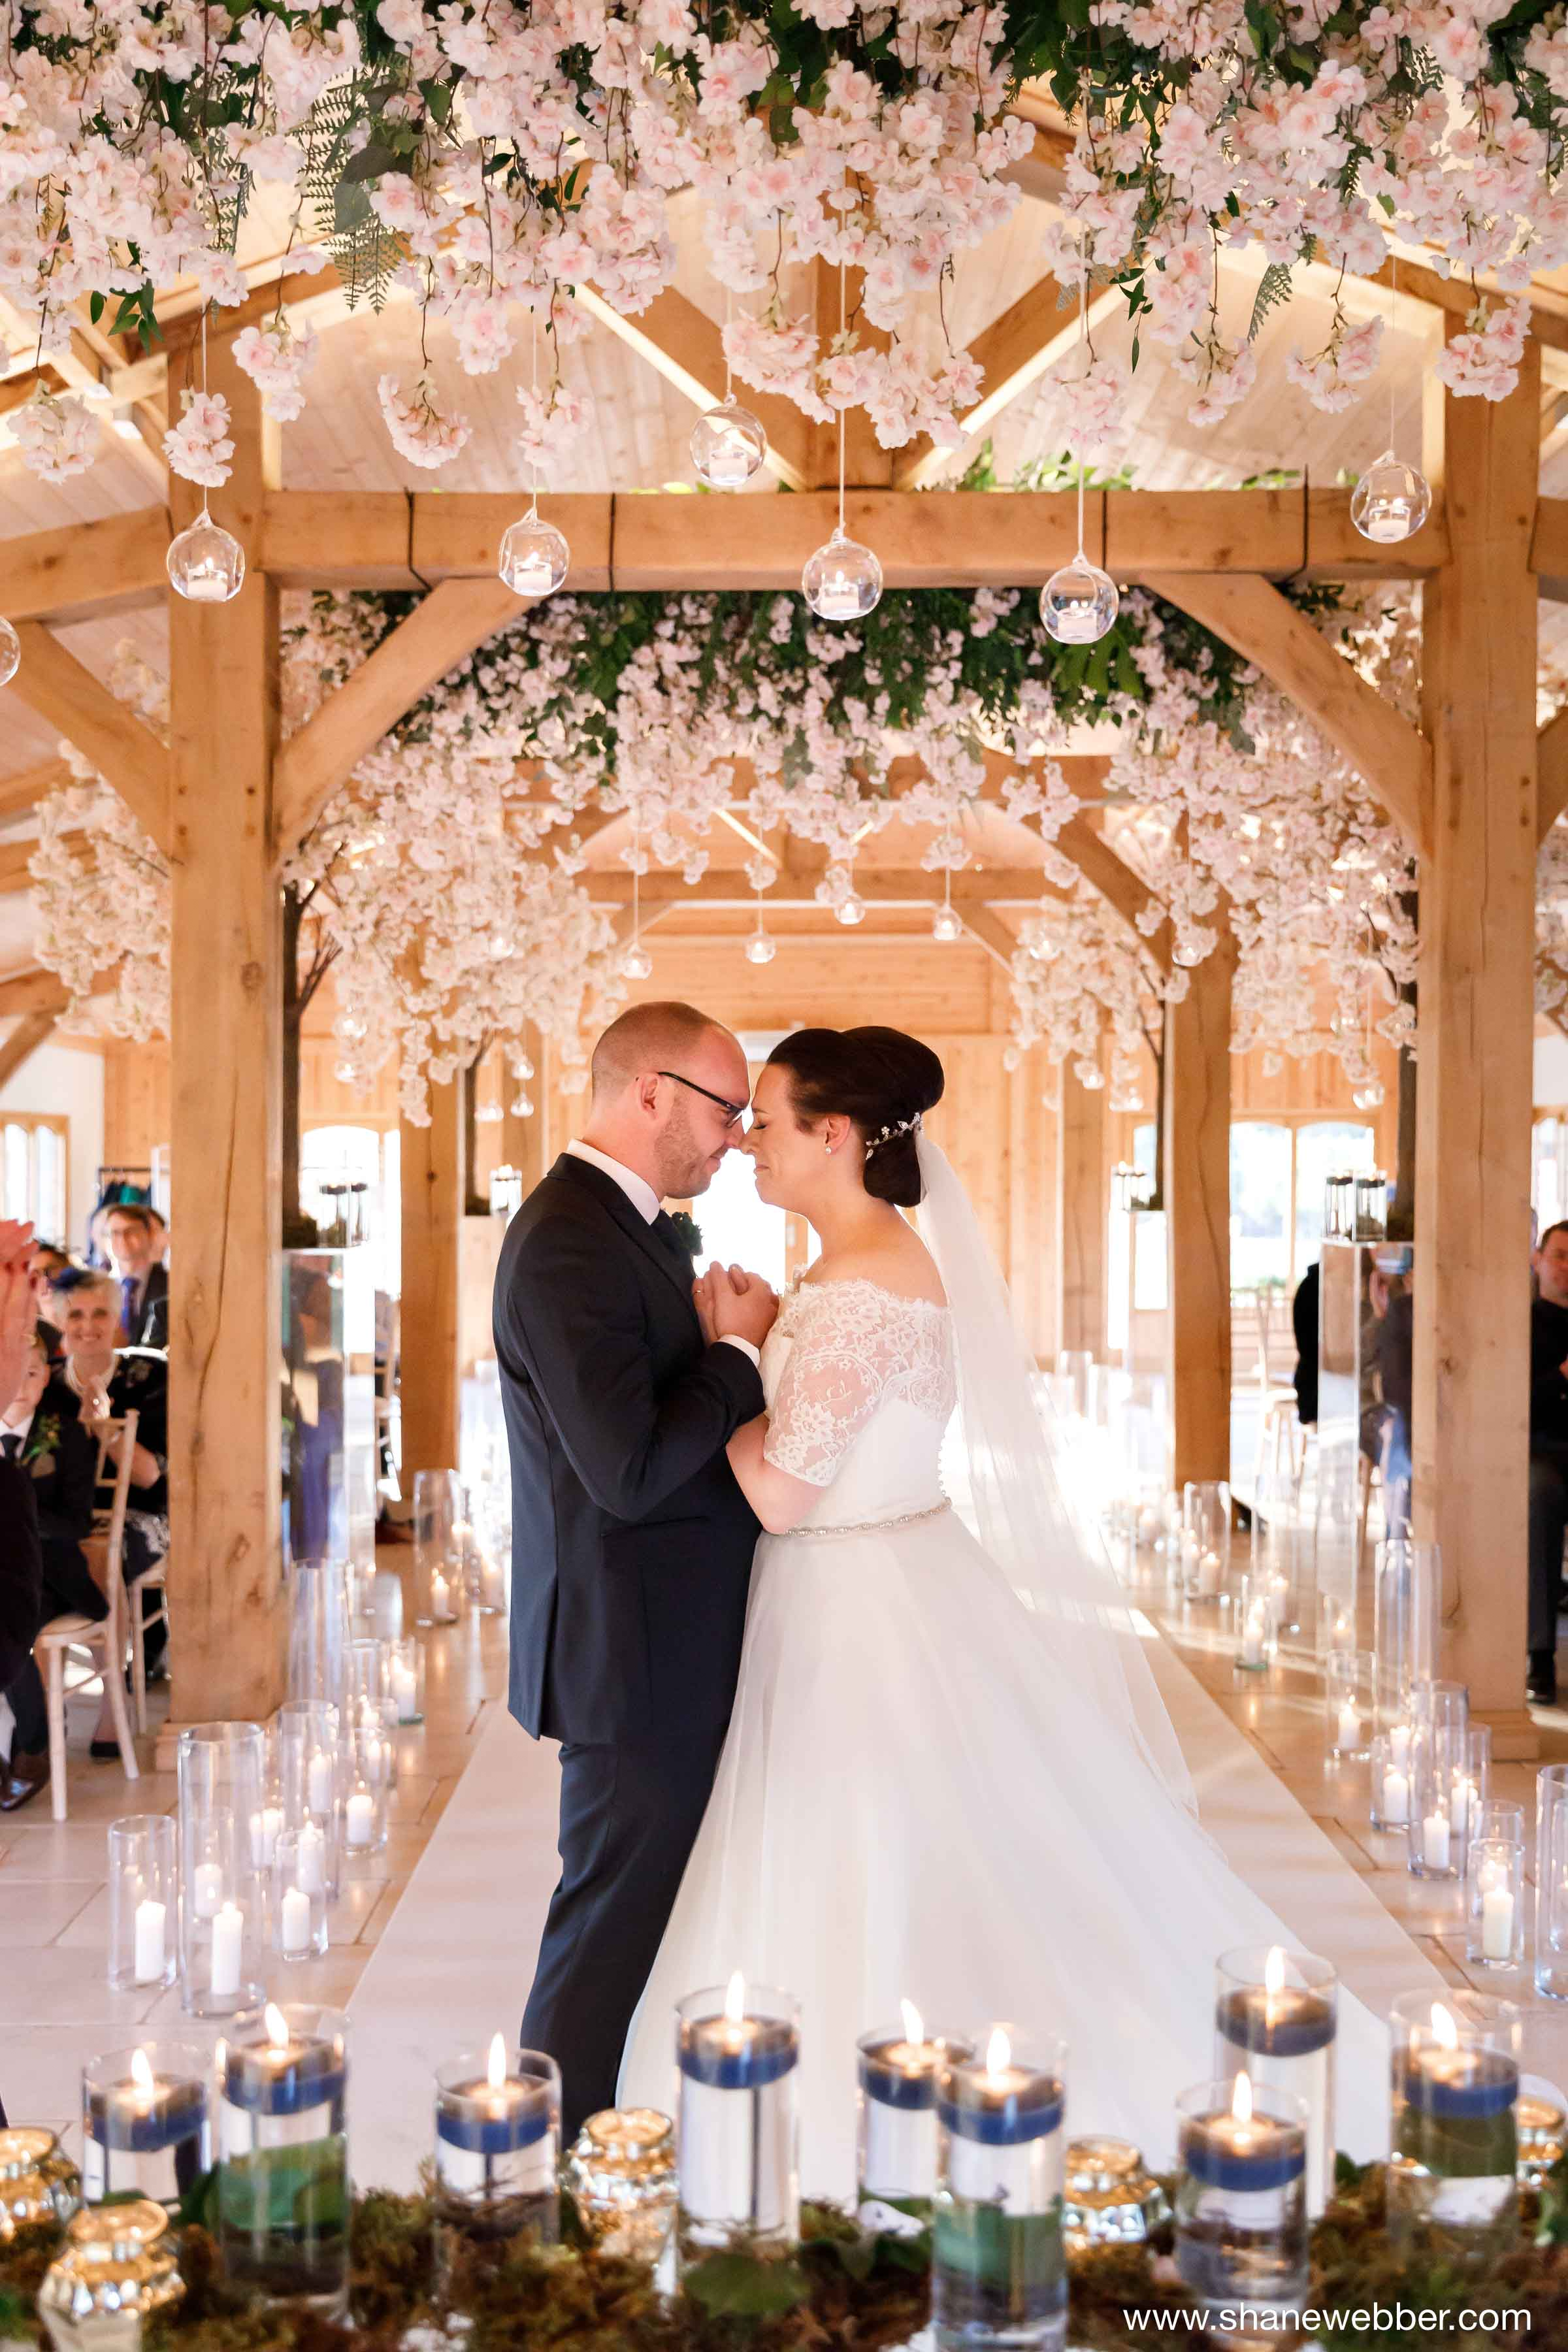 natural wedding photography at Colshaw Hall